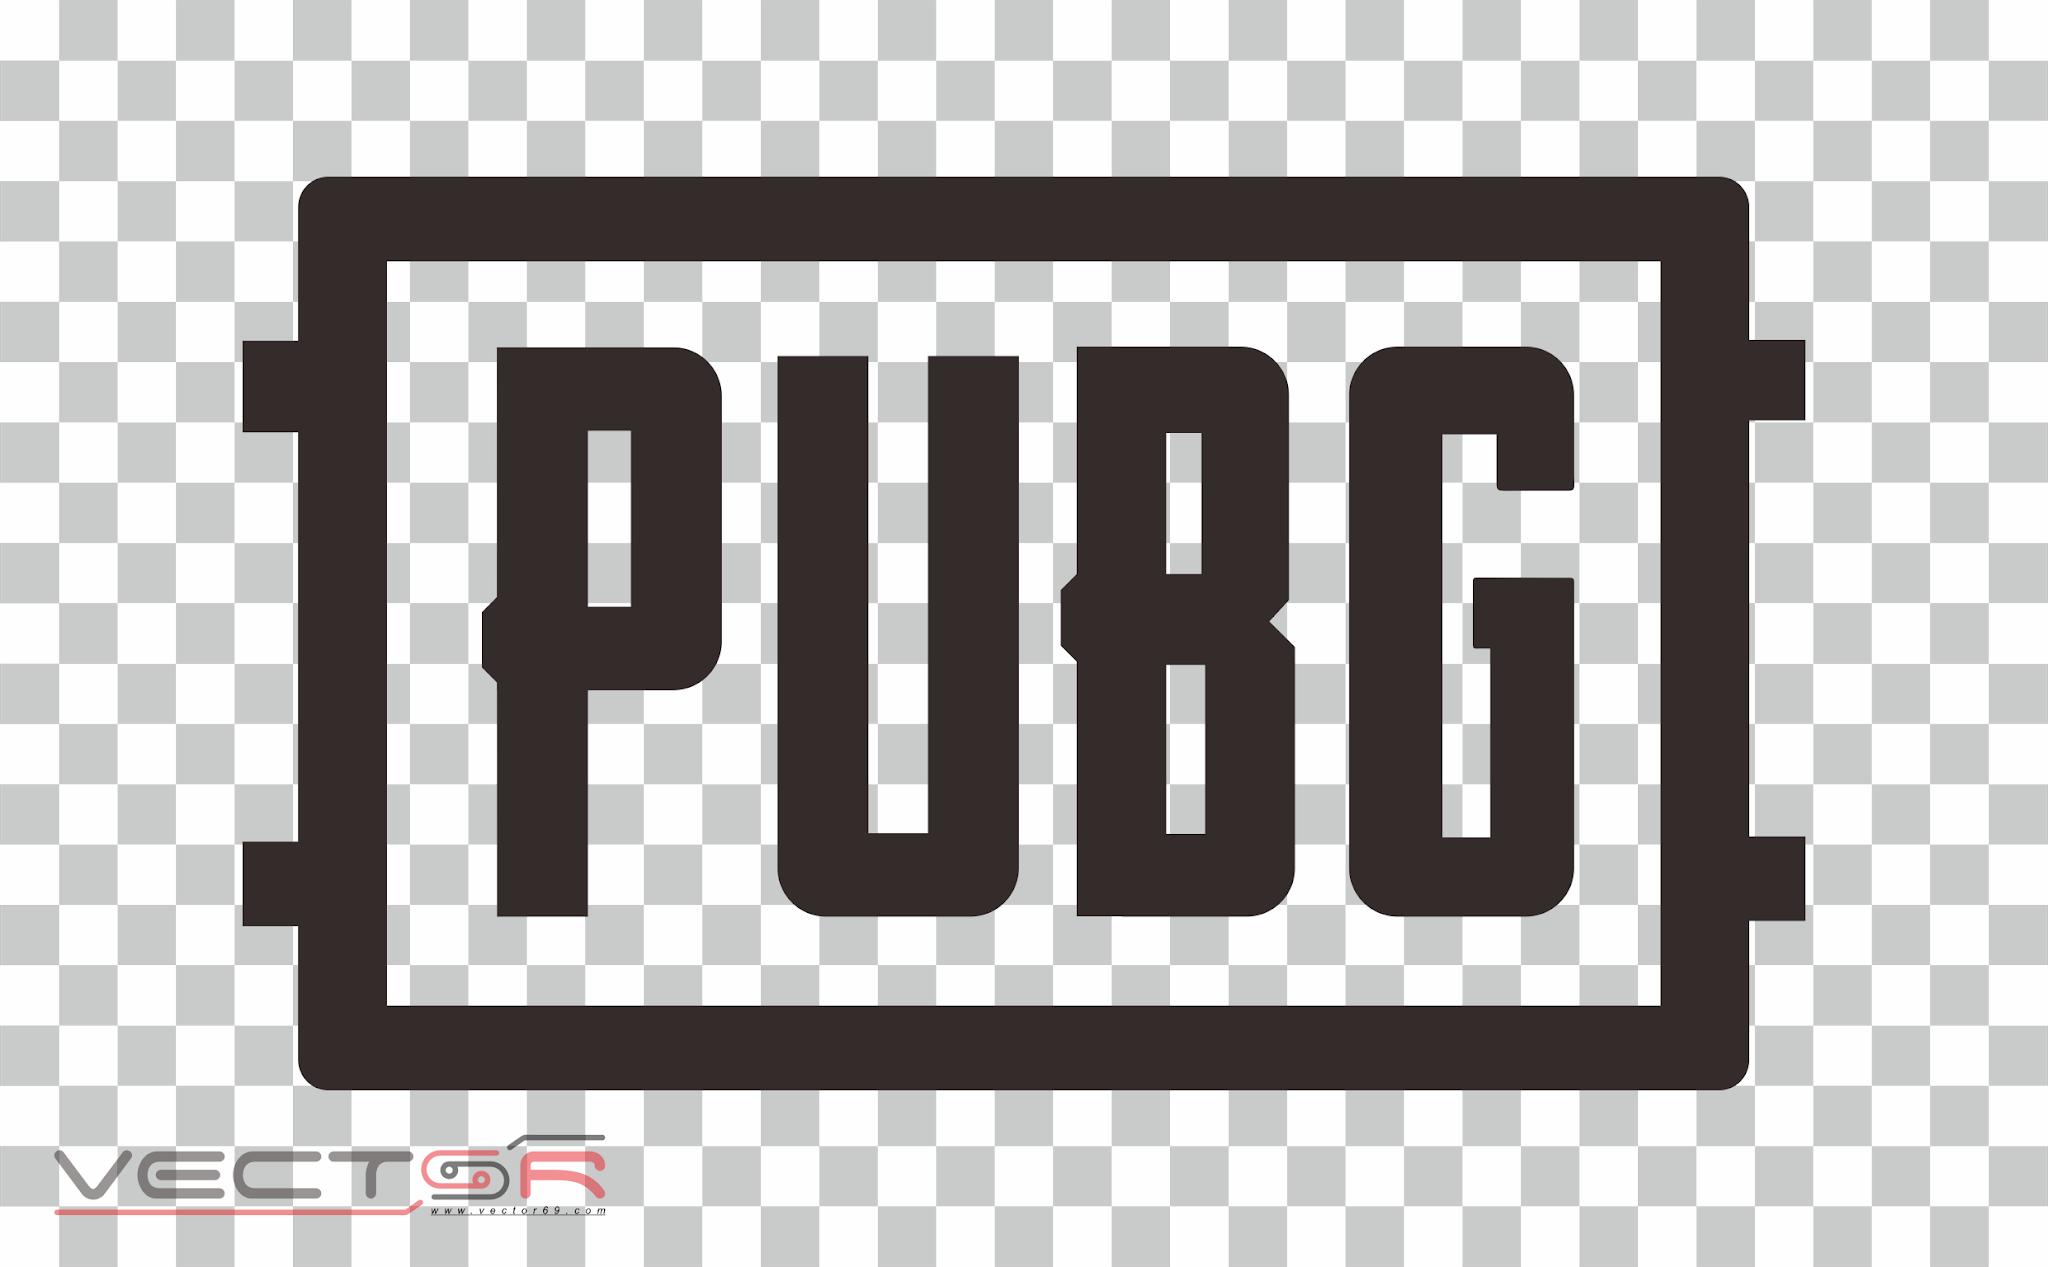 PUBG Logo - Download Vector File PNG (Portable Network Graphics)